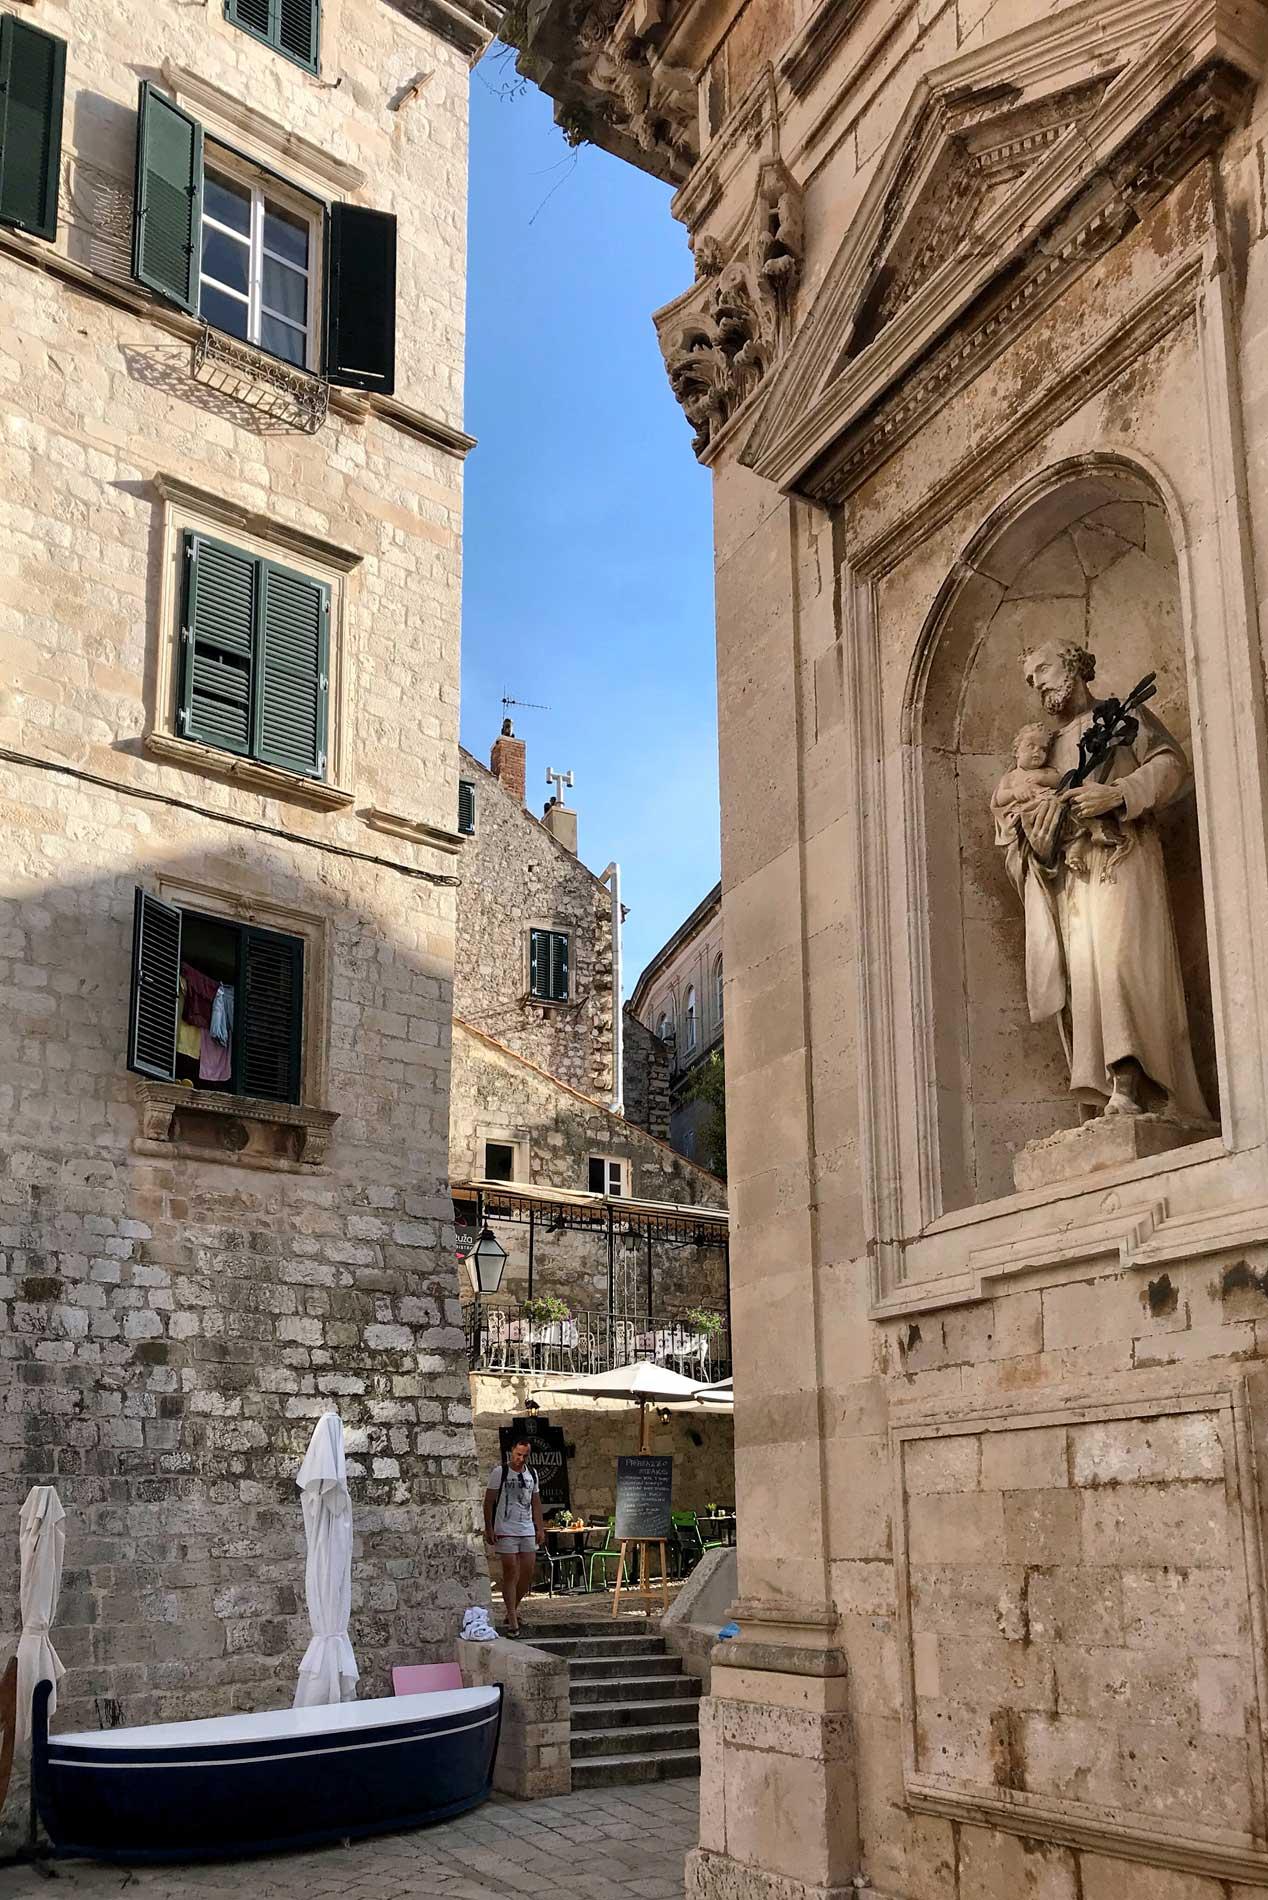 Dubrovnik-Croazia-scorcio-Cattedrale-statua-casa-cielo